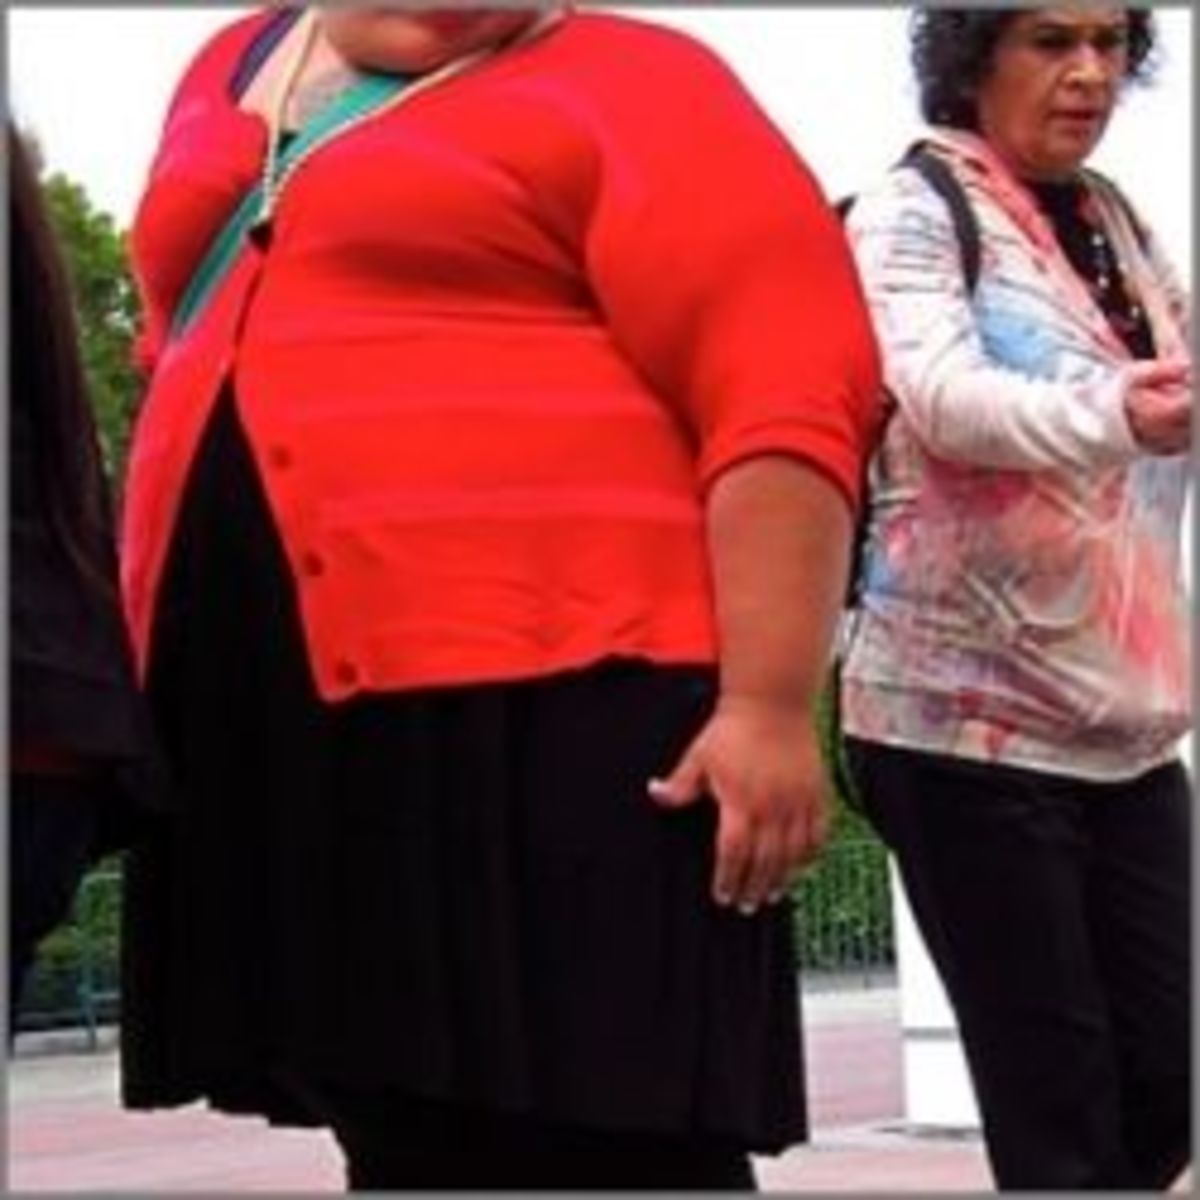 Surplus of Body Weight